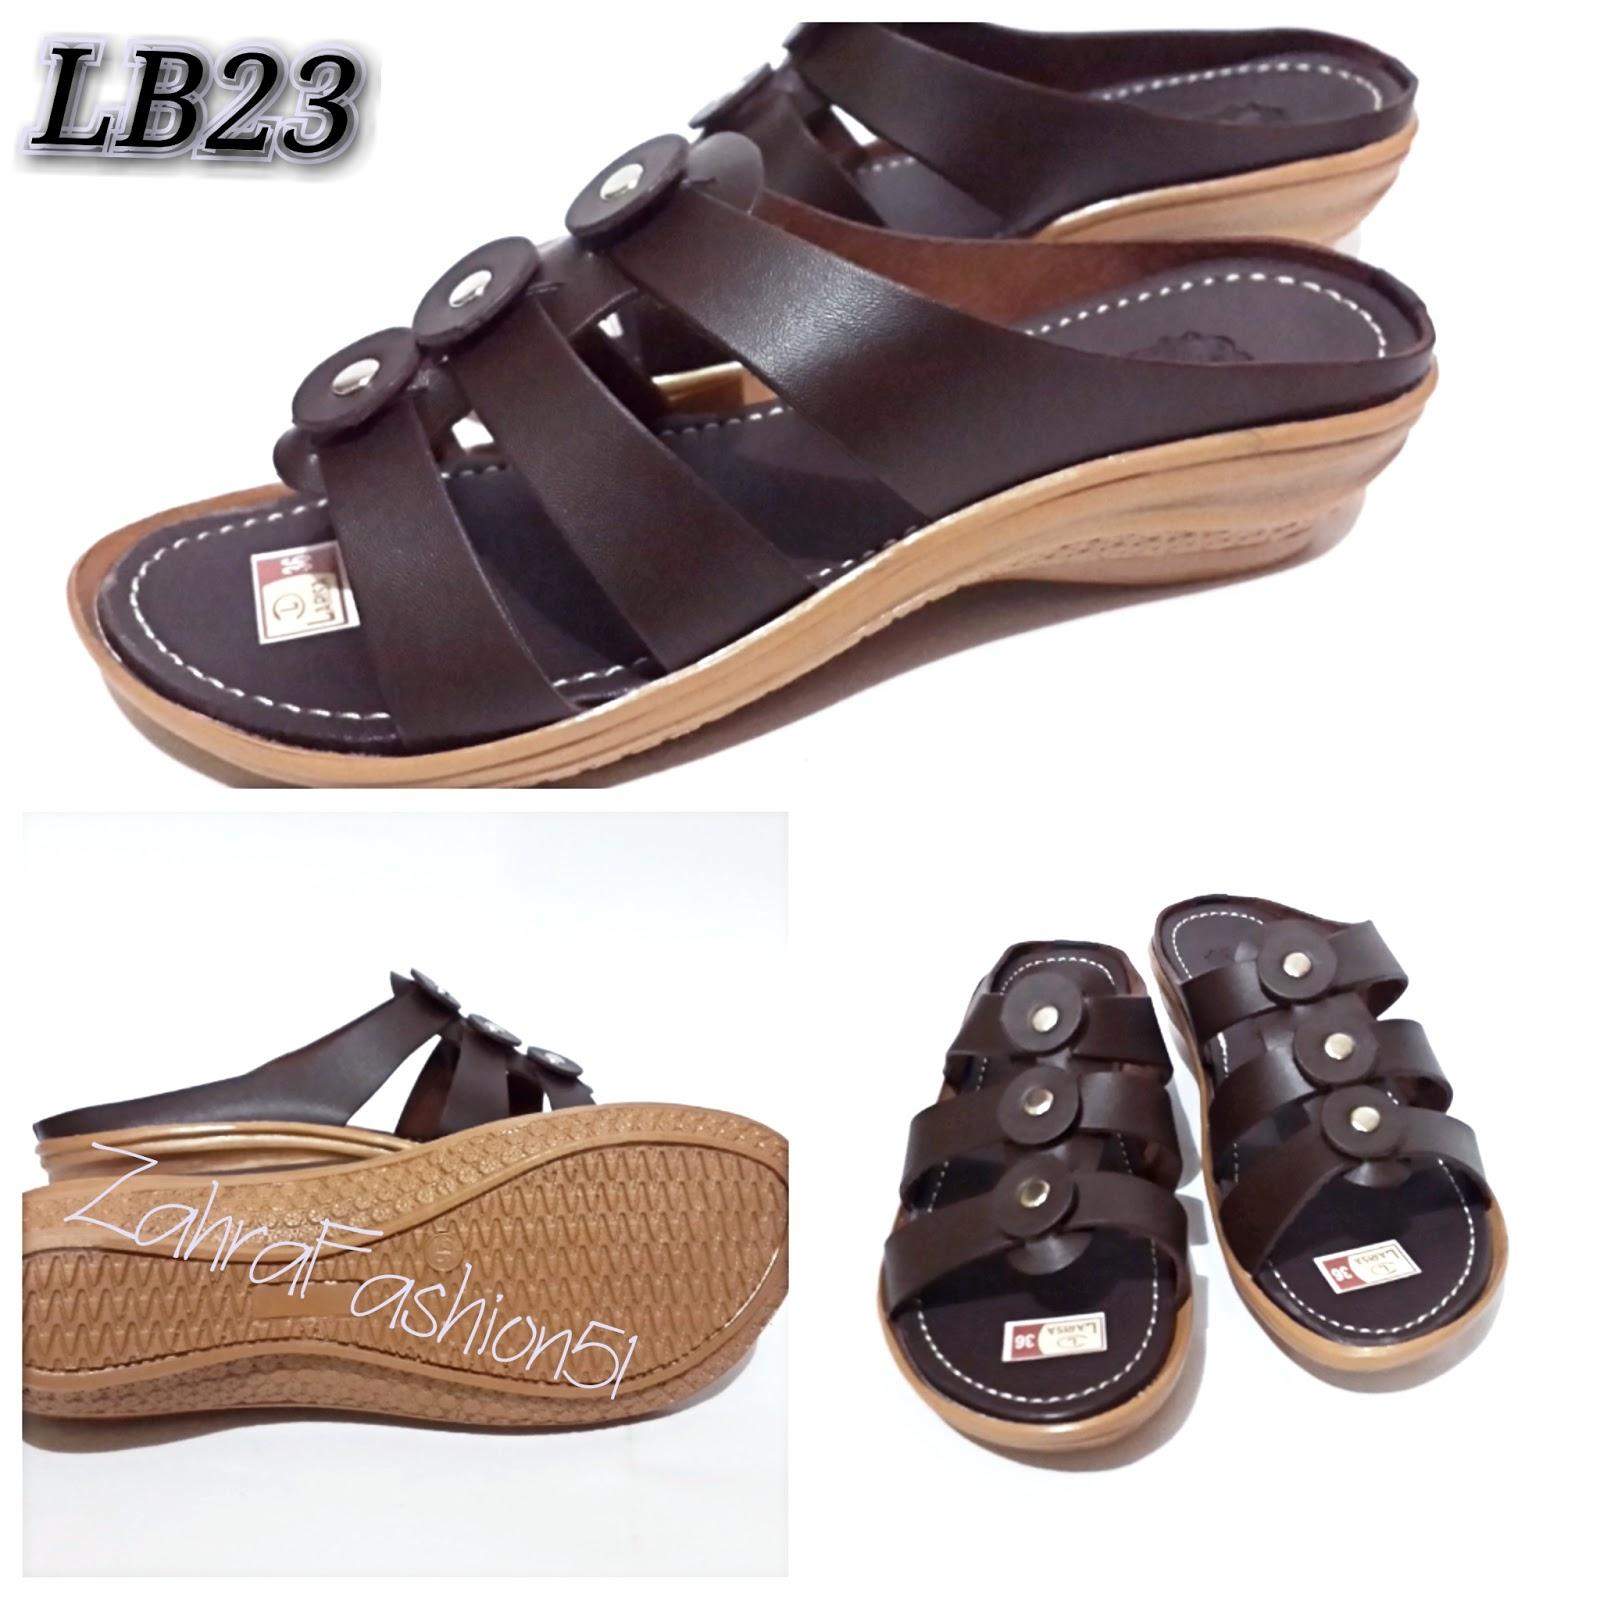 Sandal Wanita Heels Hitam Satu Ban3 Daftar Harga Terkini Dan Sepatu High Fs62 Coklat Larisa Borongsong